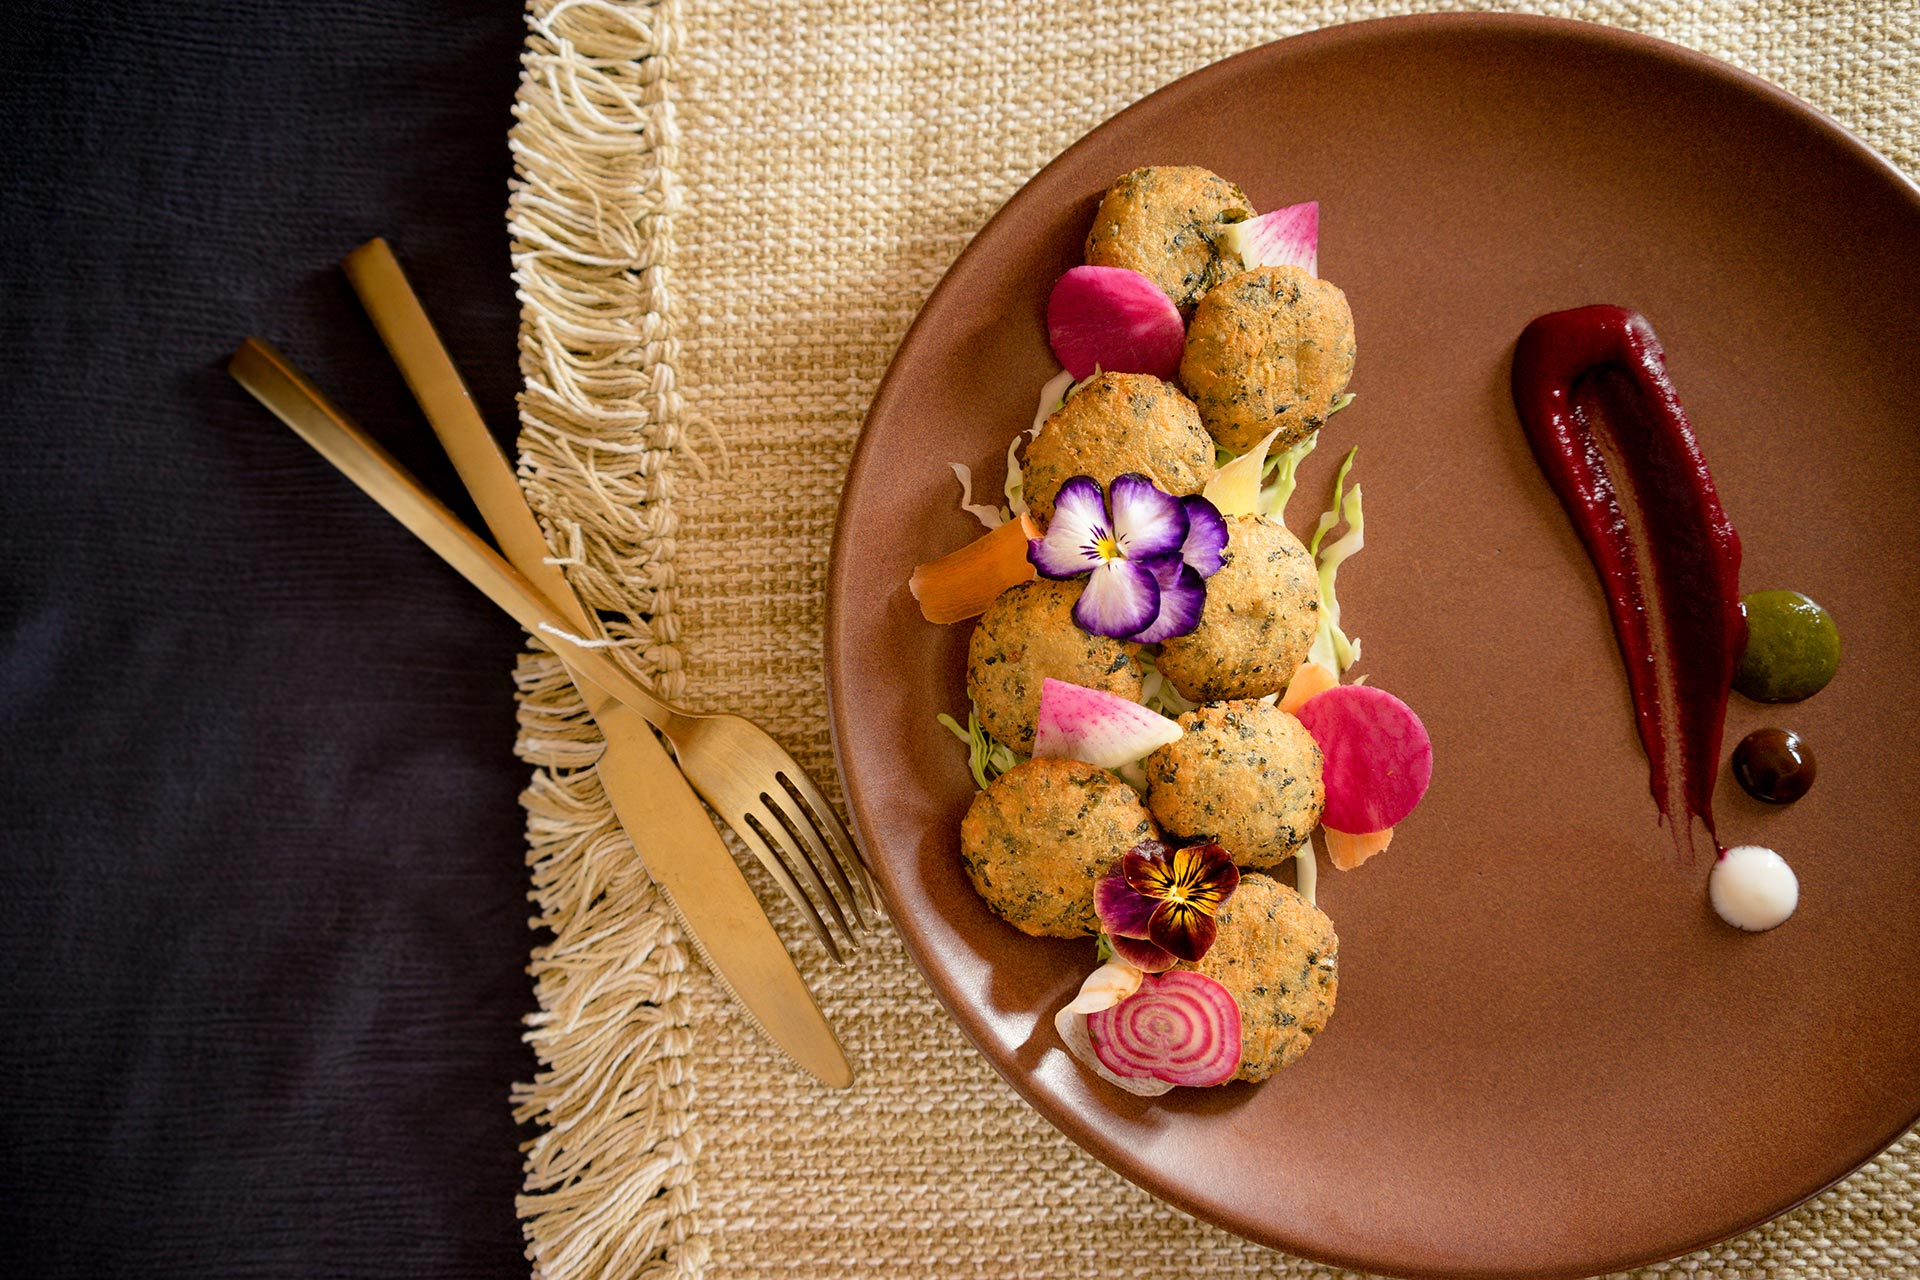 keeva-sf-restaurant-food-photographer-a-few-good-clicks-18.jpg